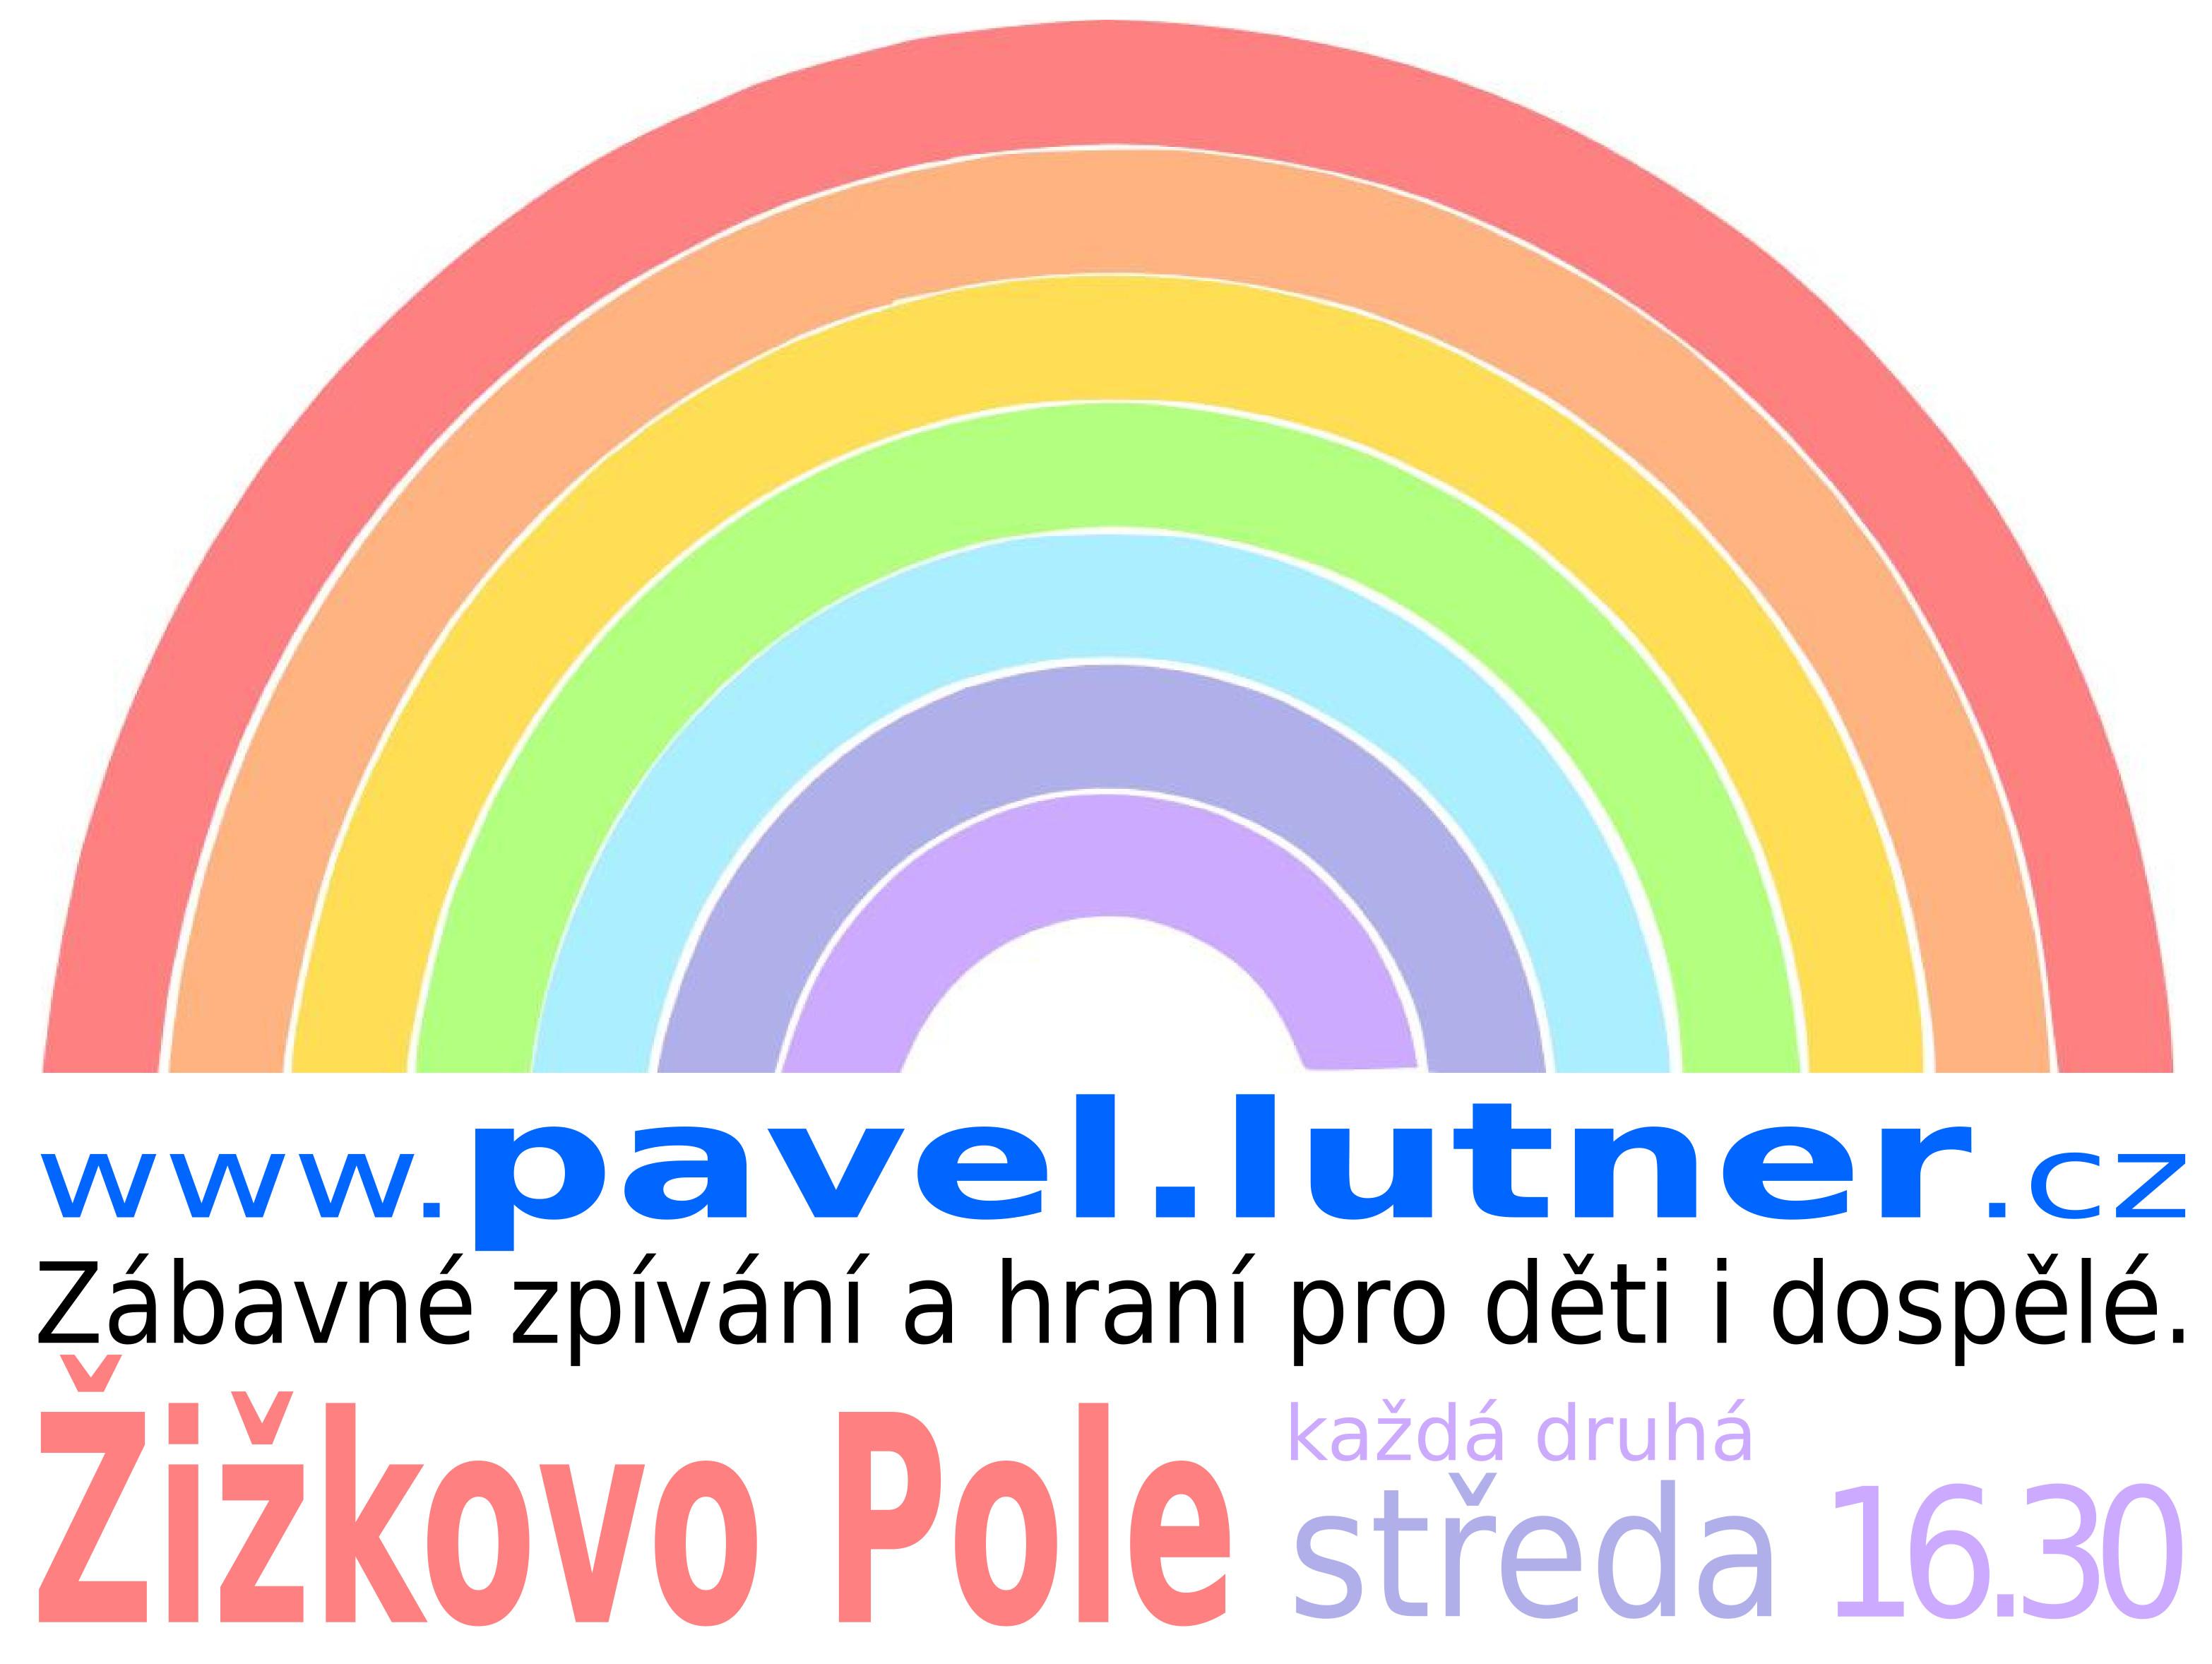 duha logo pro 2016 - 2017 - Žižkovo Pole